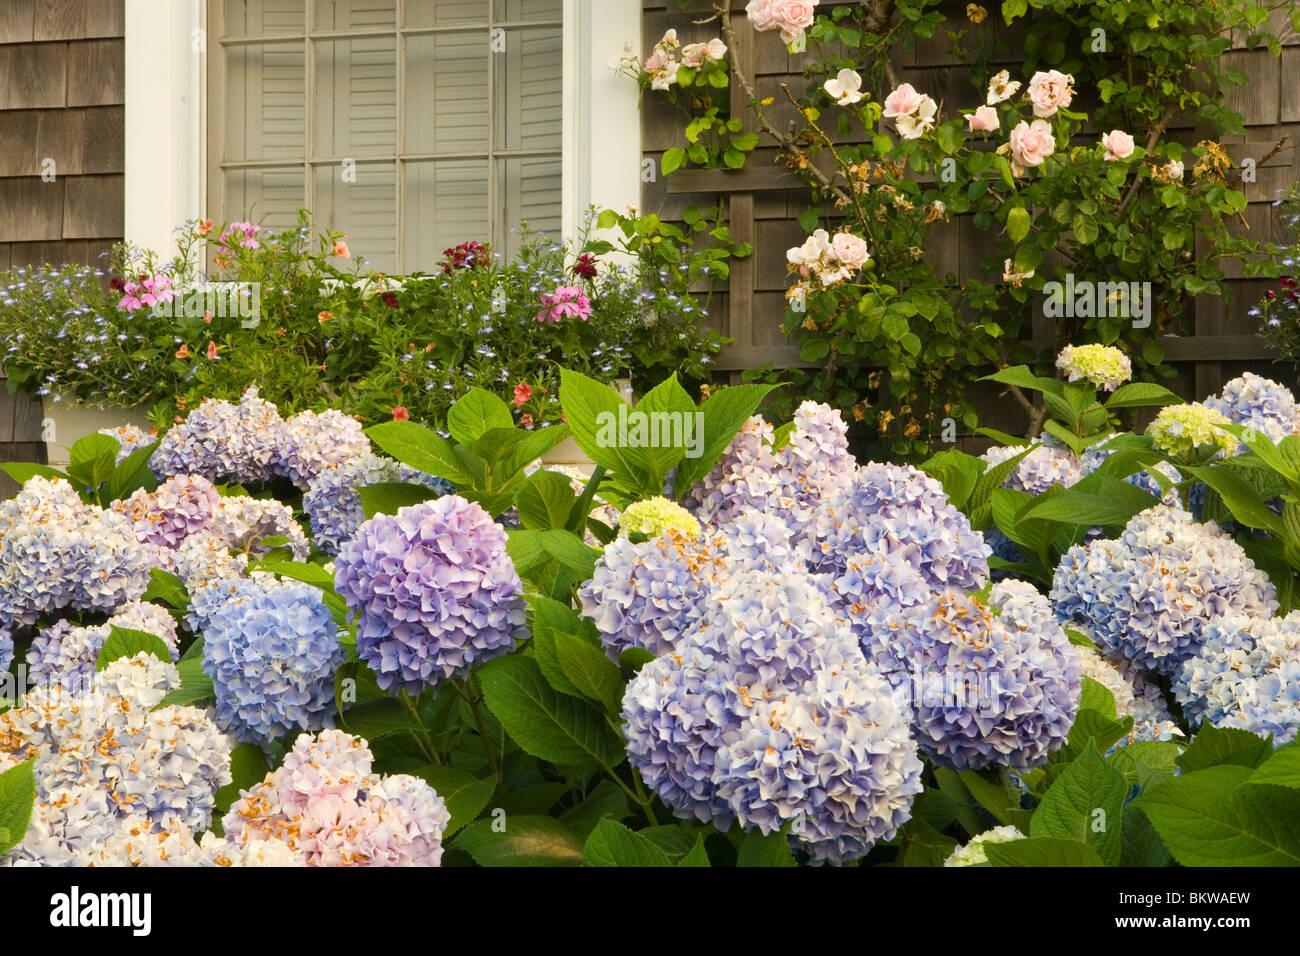 Hydrangea and Nantucket garden. - Stock Image